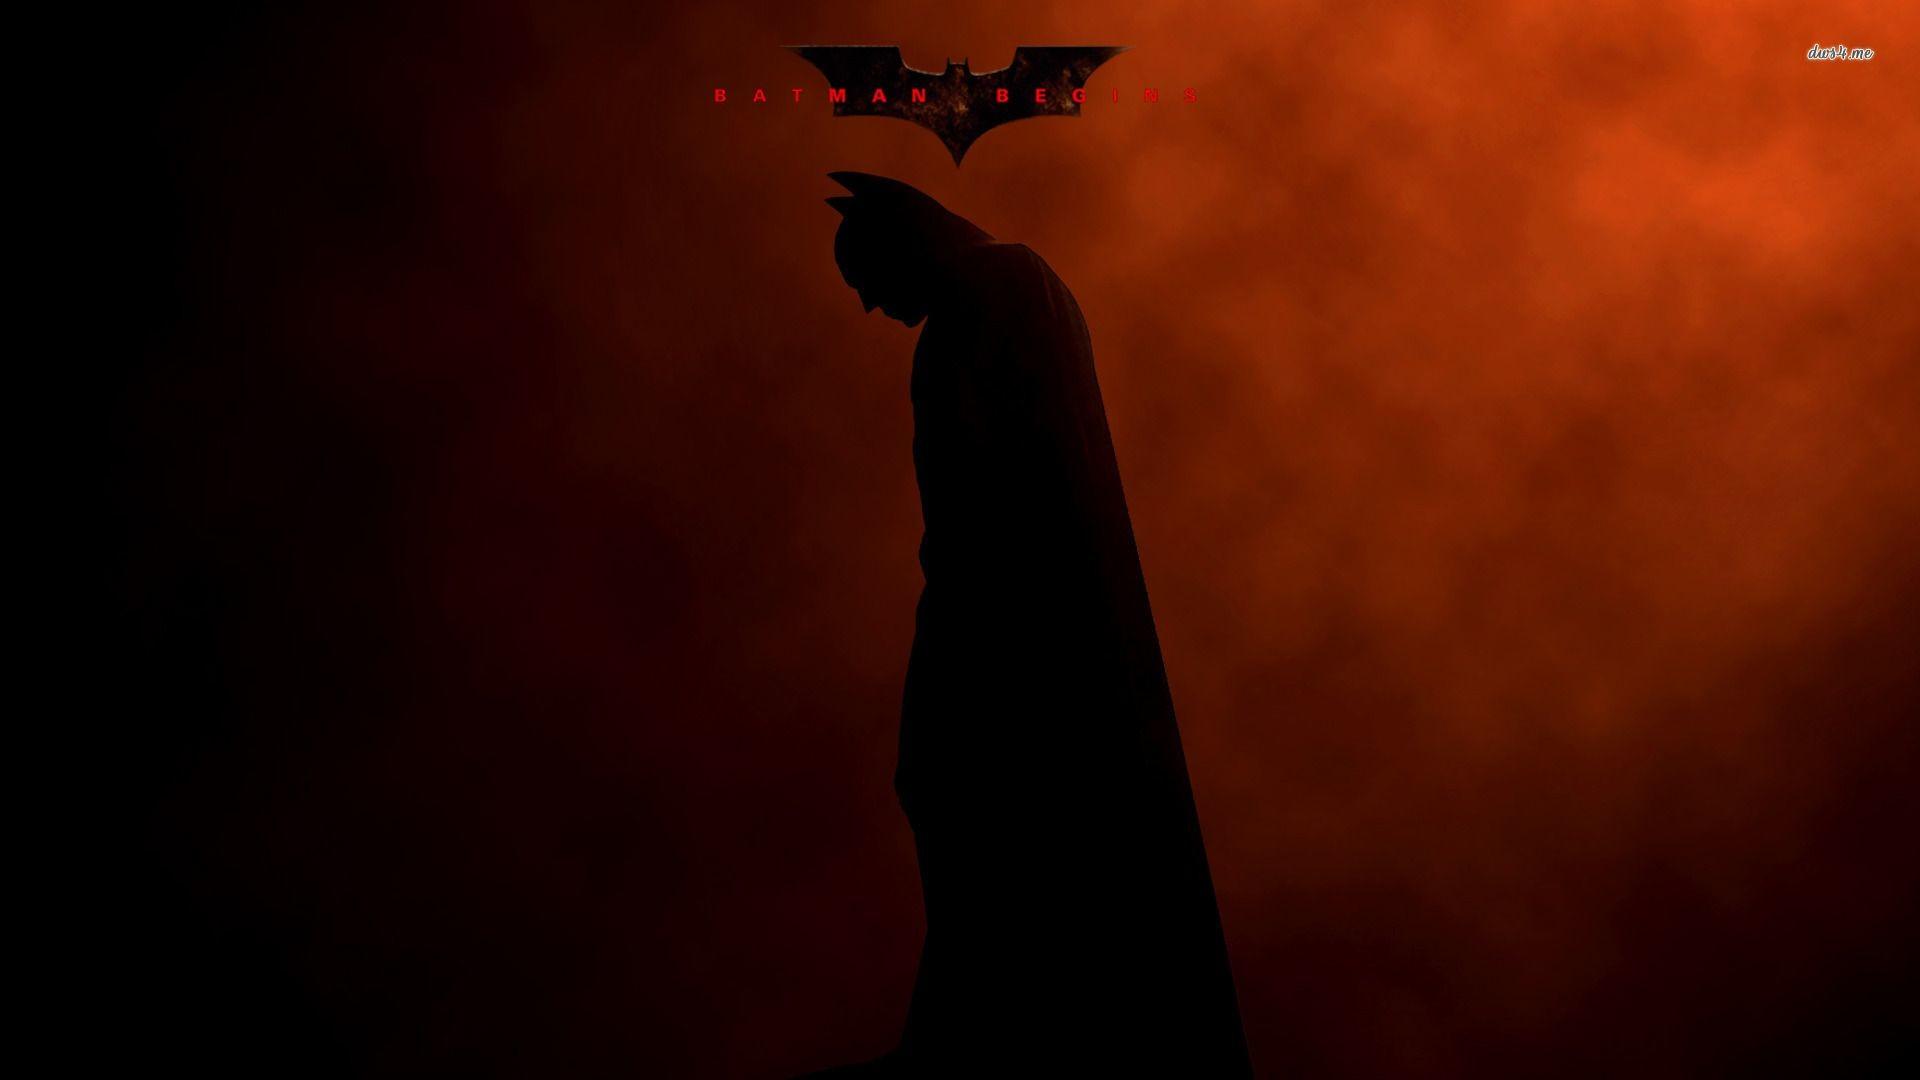 Batman Begins wallpaper – Movie wallpapers – #6106